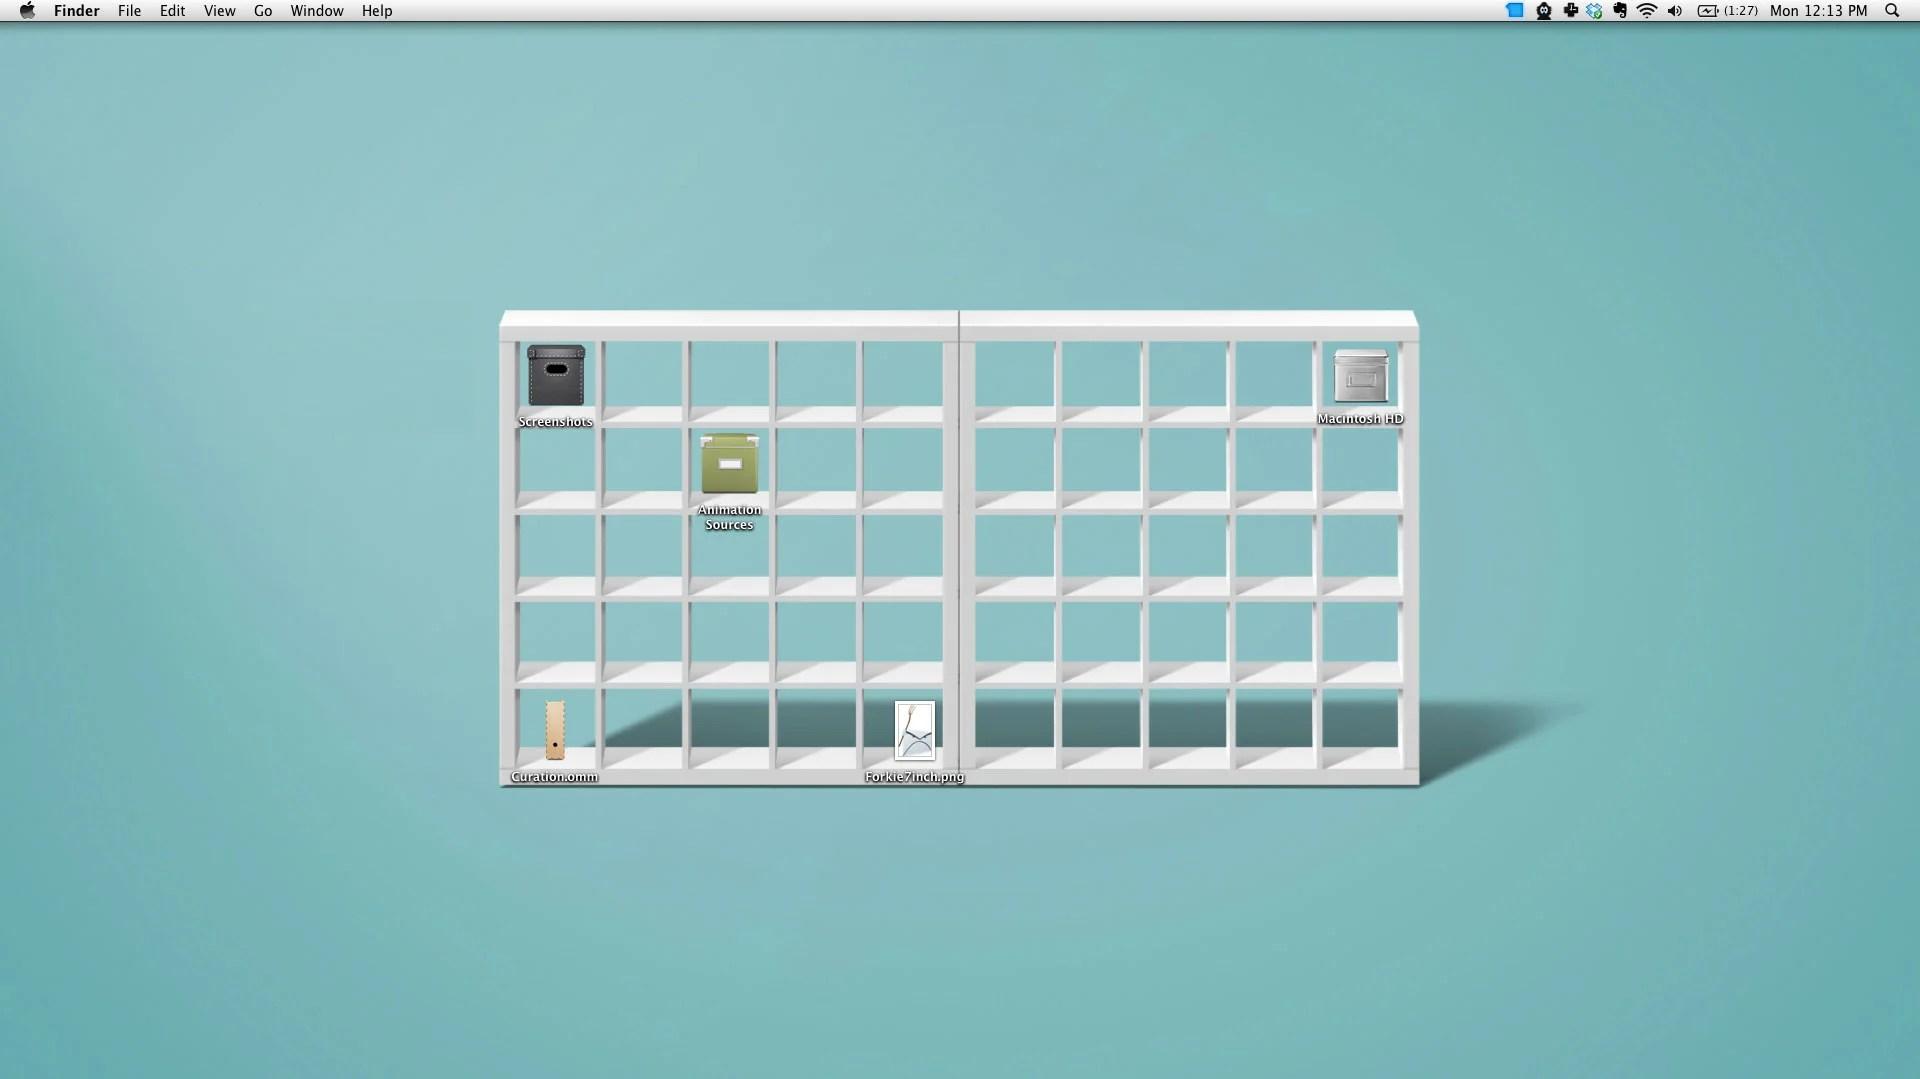 Tom Brady Wallpaper Iphone X Ikea Shelf Desktop